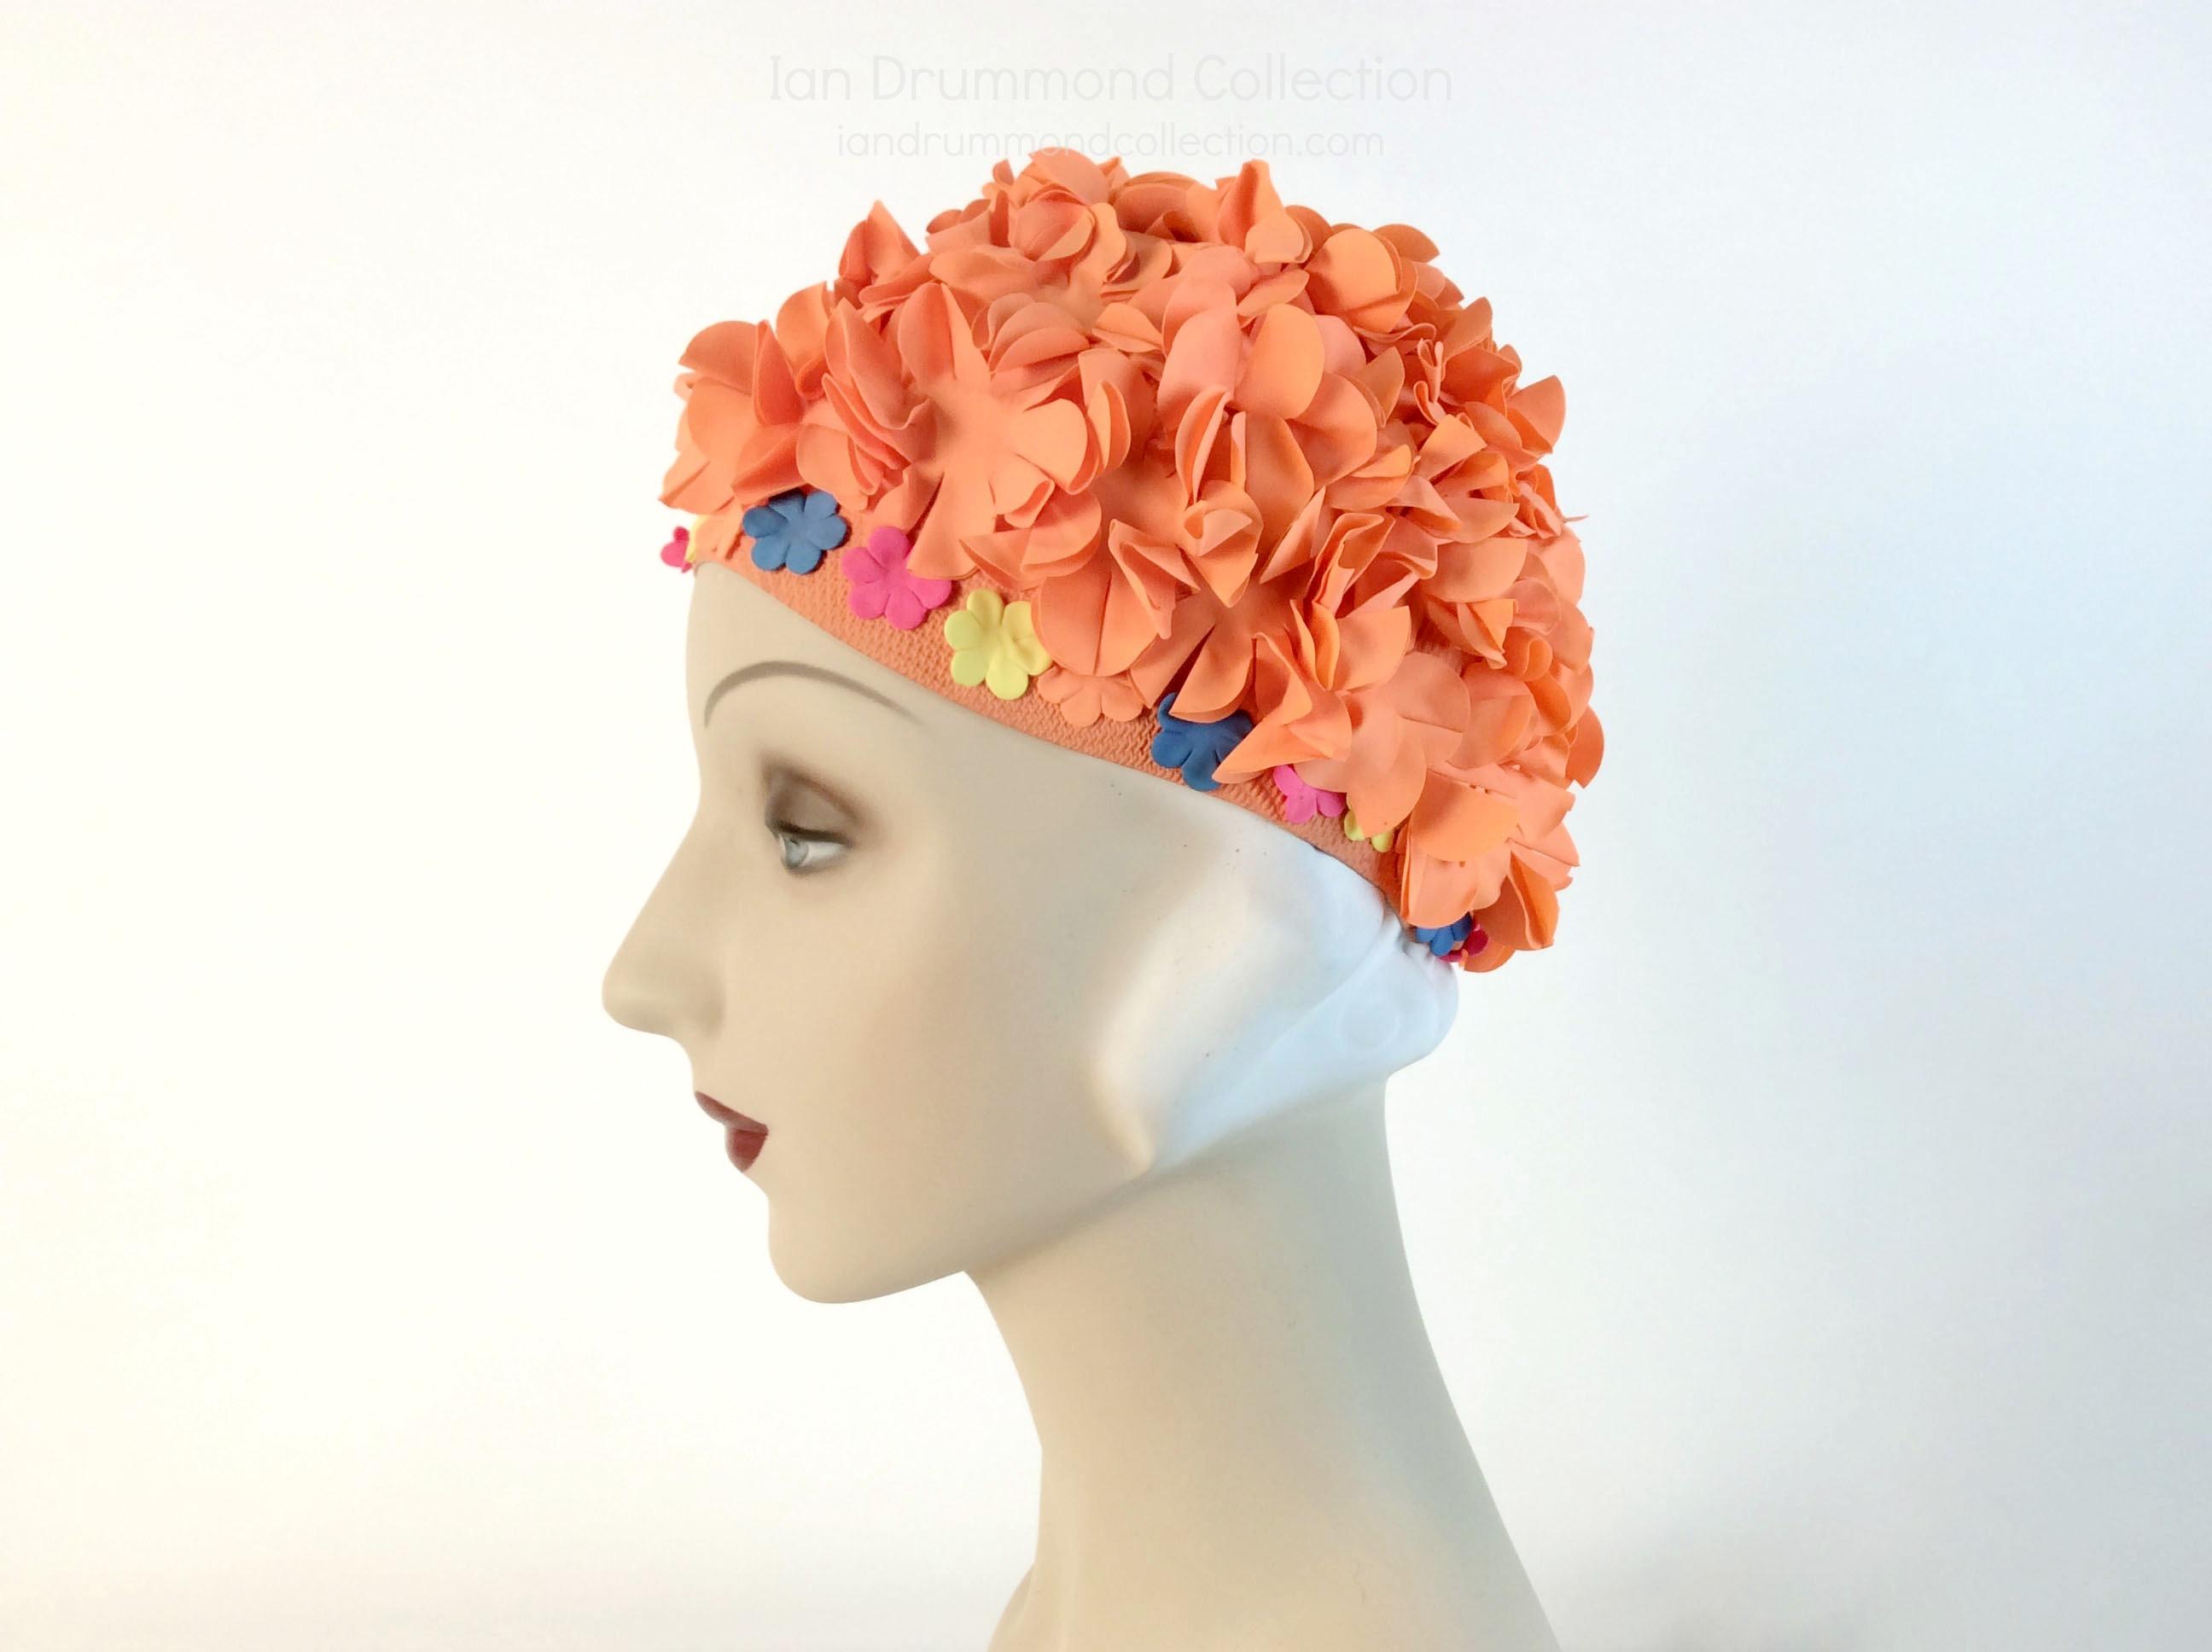 IDC Movie Wardrobe Rental Swim Cap 14 Neon Orange with Floppy Flowers and Multicloured Flowers